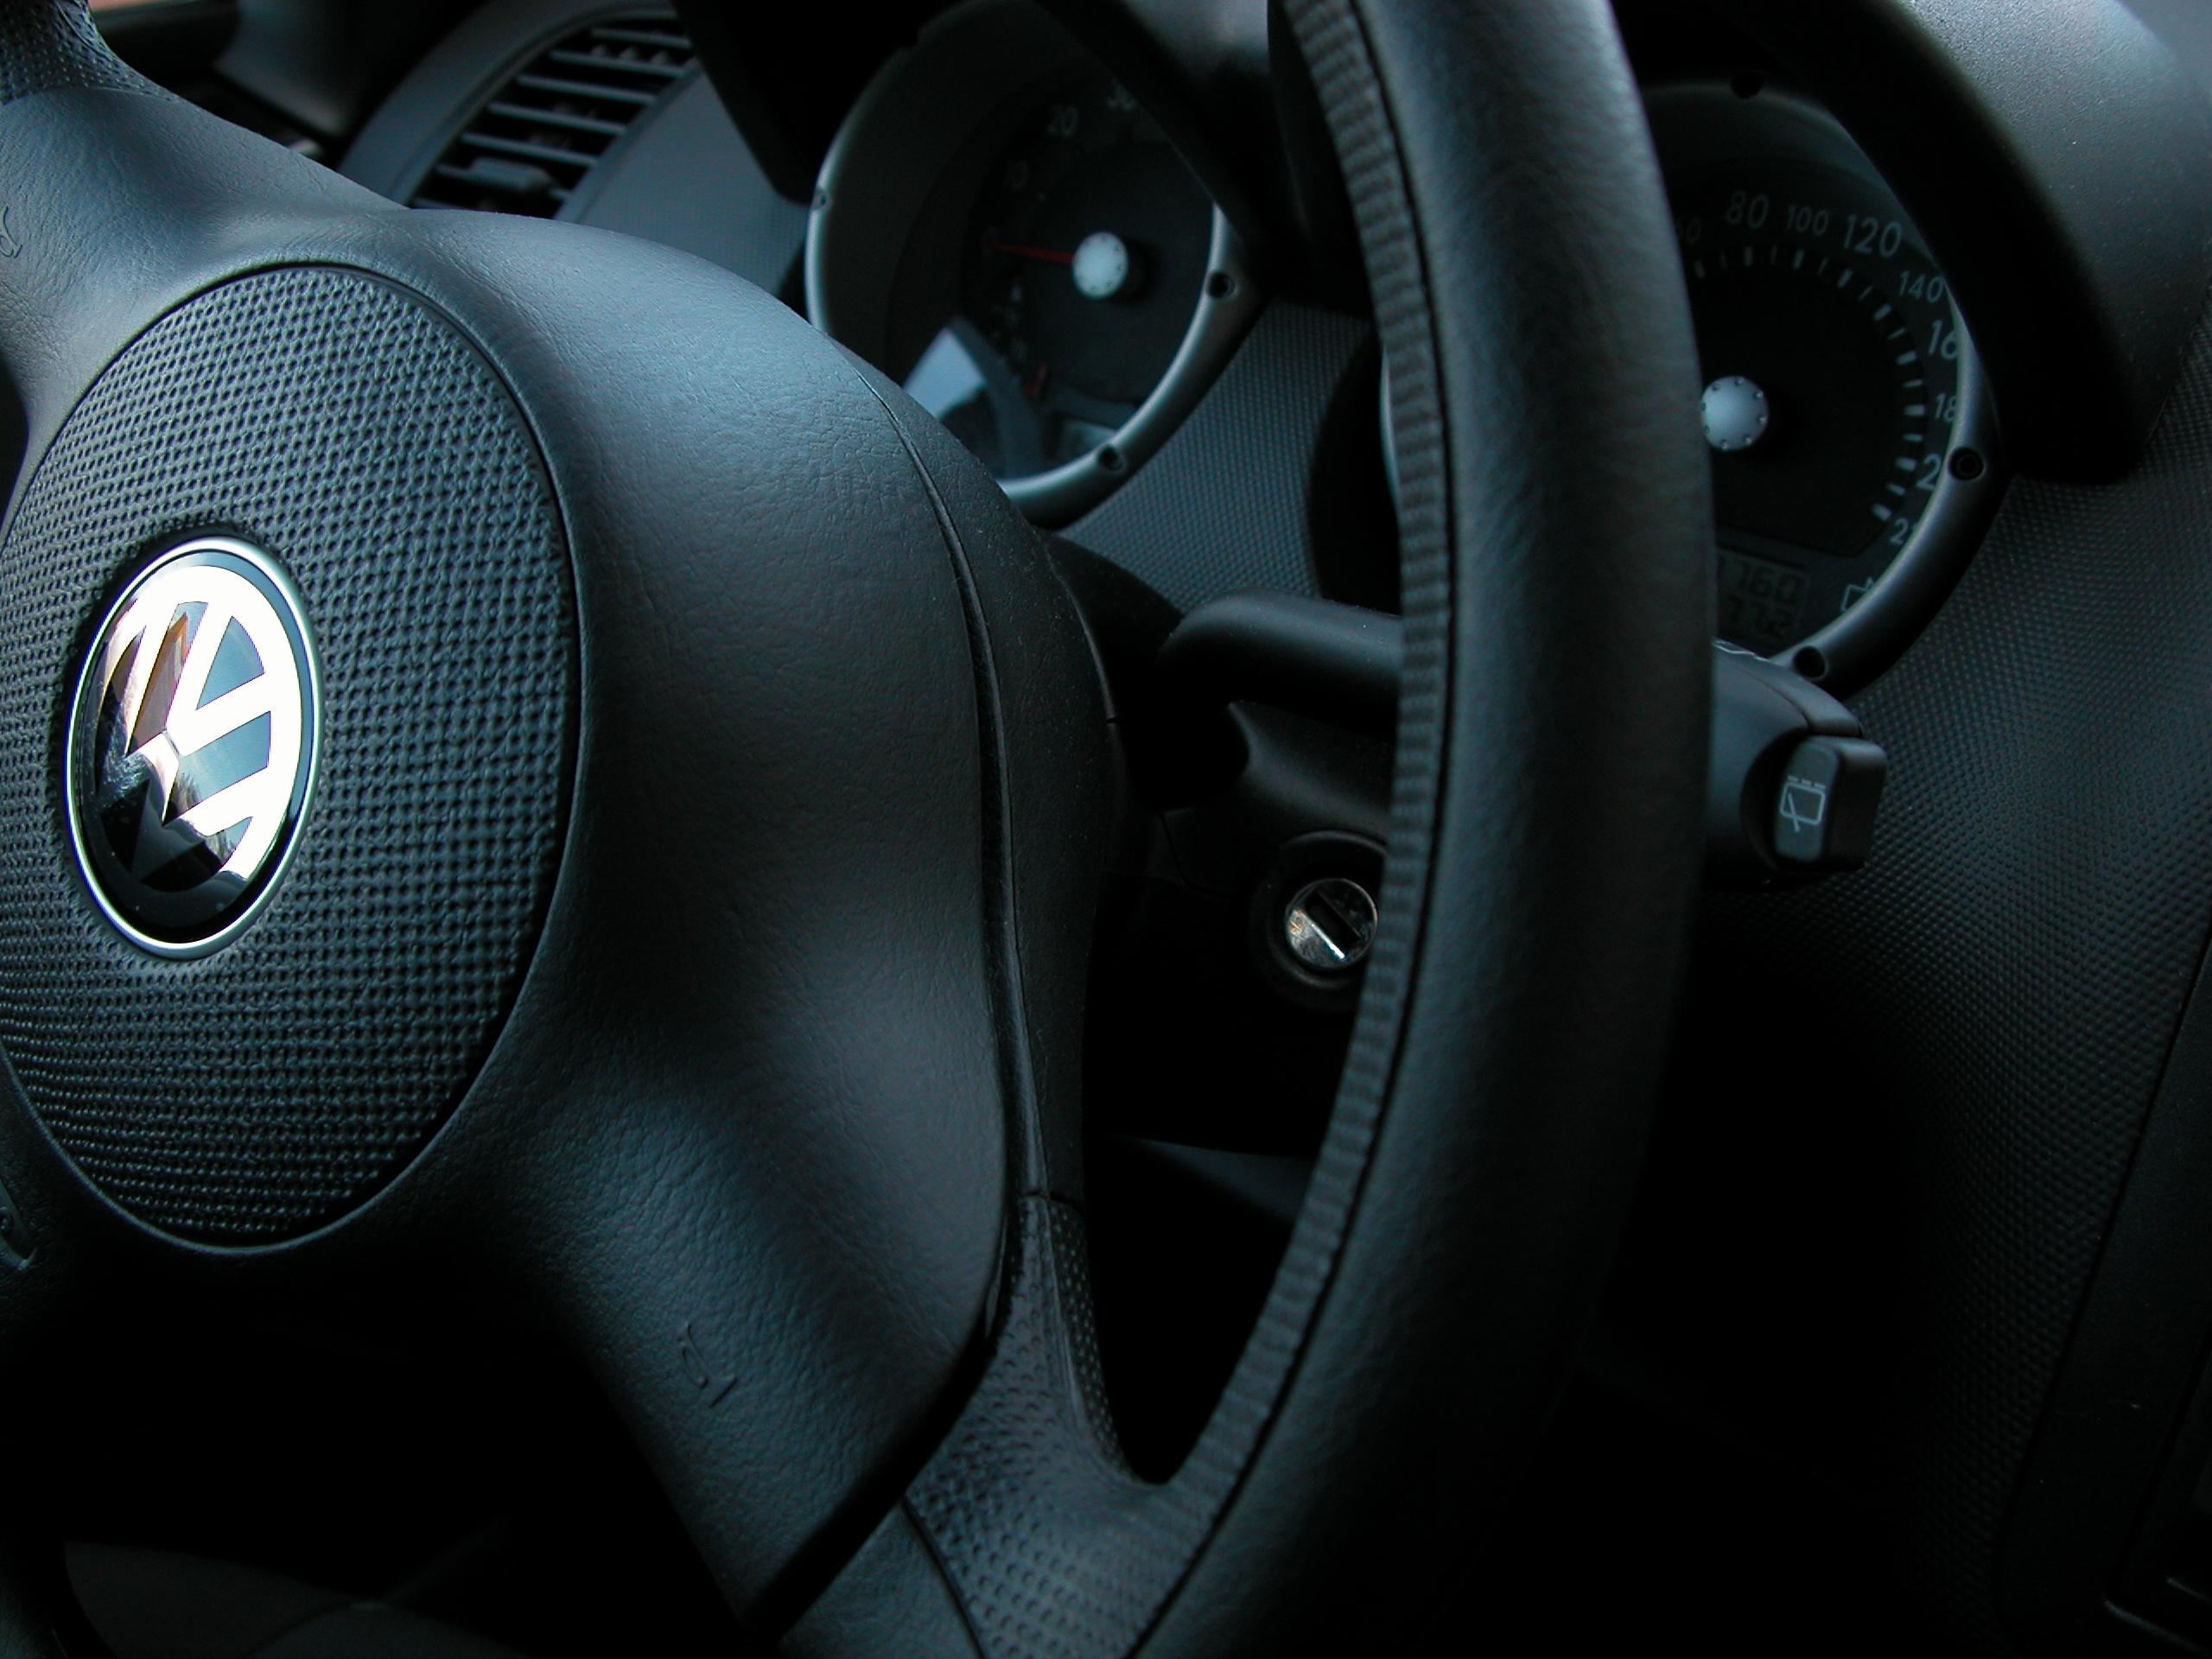 wheel steering steeringwheel volkswagen black interior dashboard soft grip